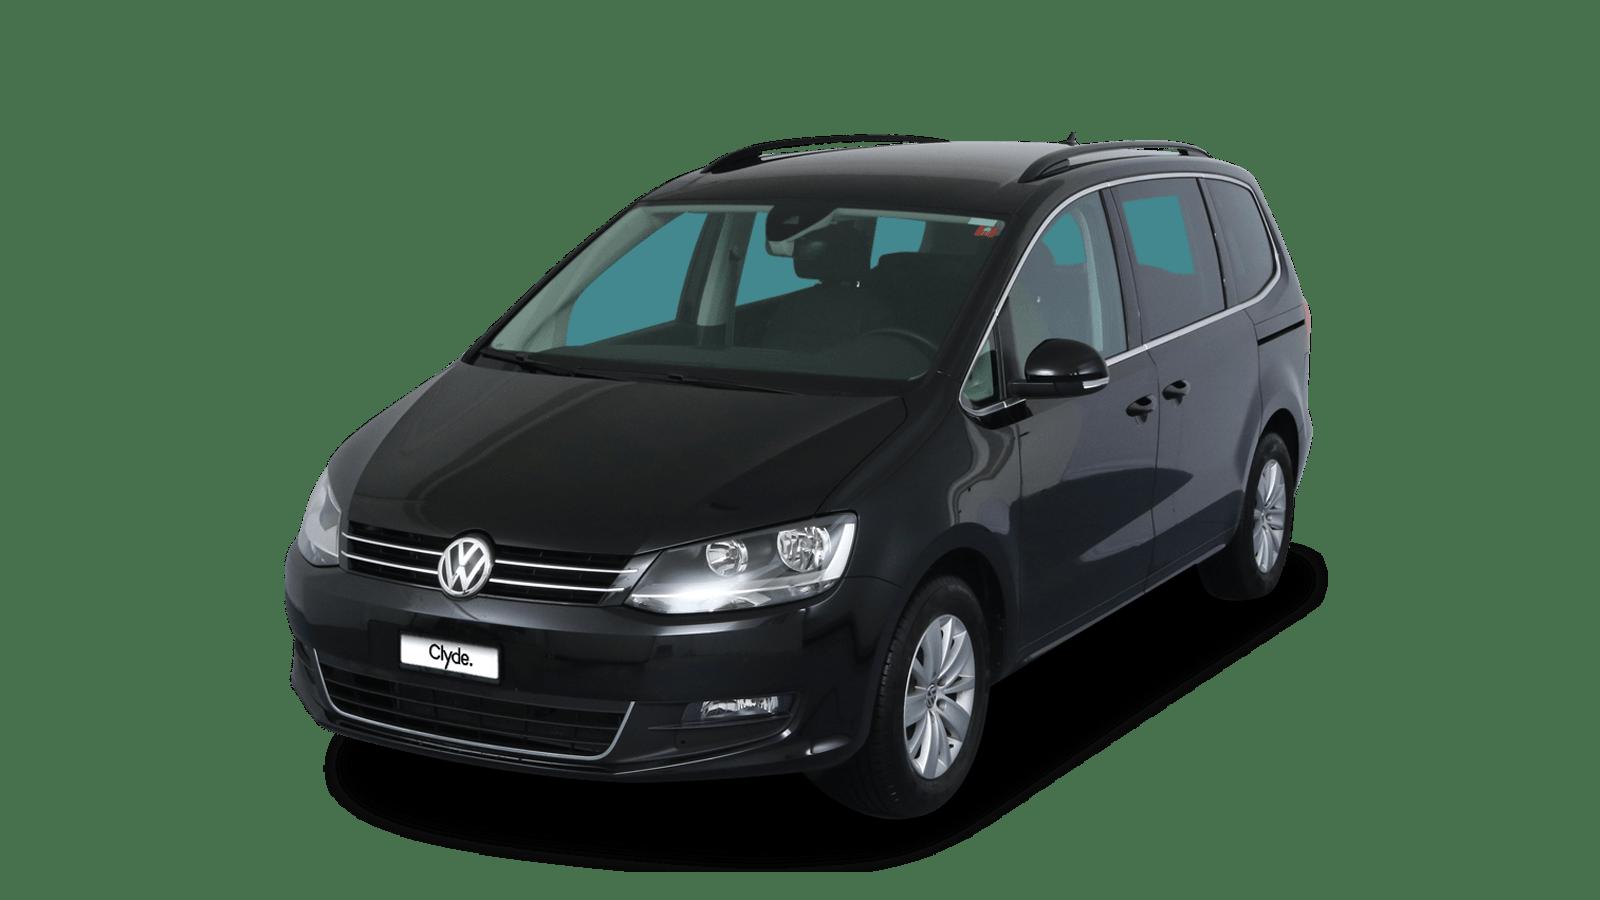 VW Sharan Black front - Clyde car subscription